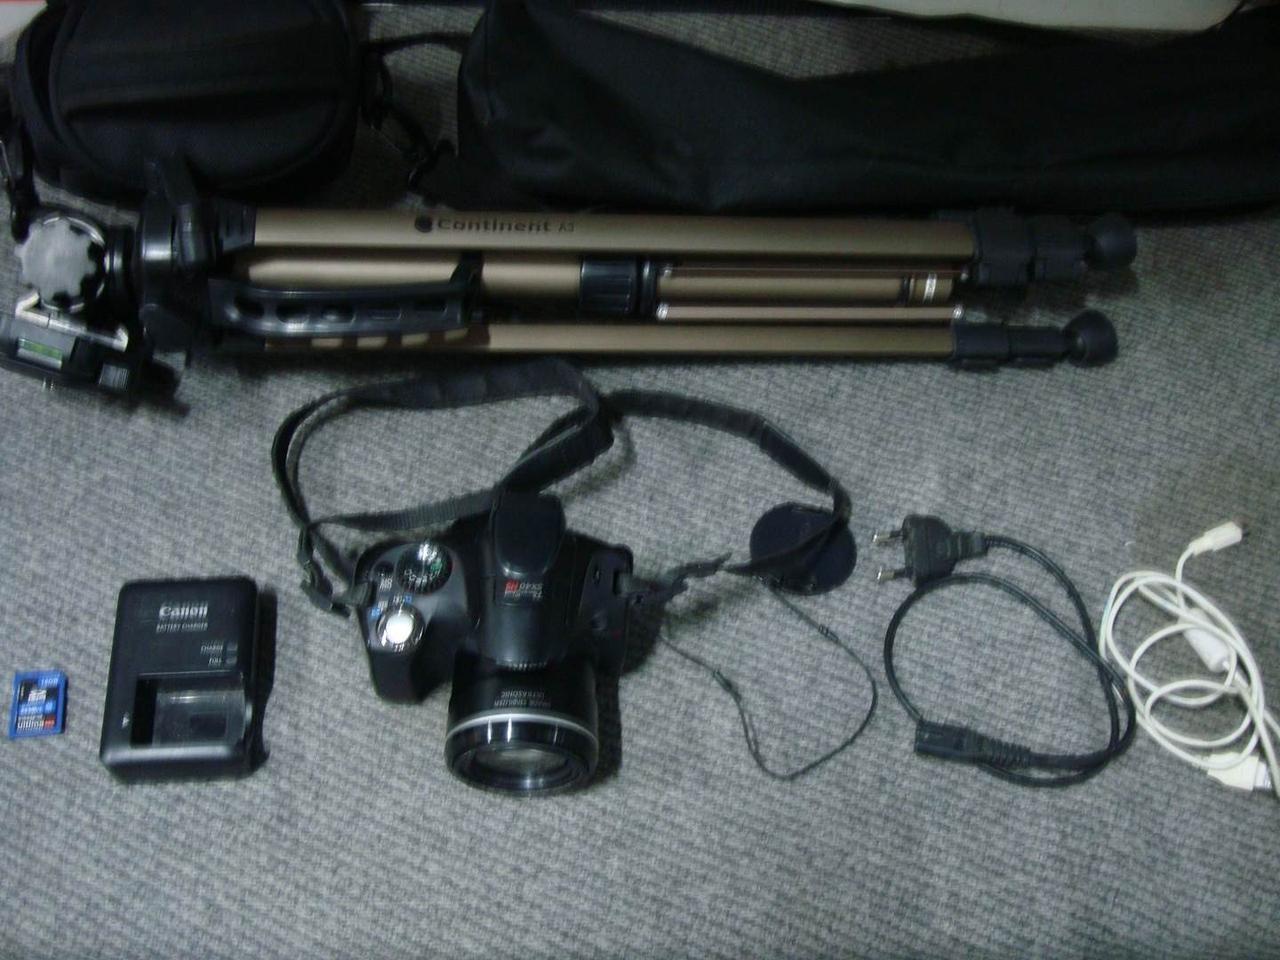 Фотоапарат Canon PowerShot SX40 HS с сумкой